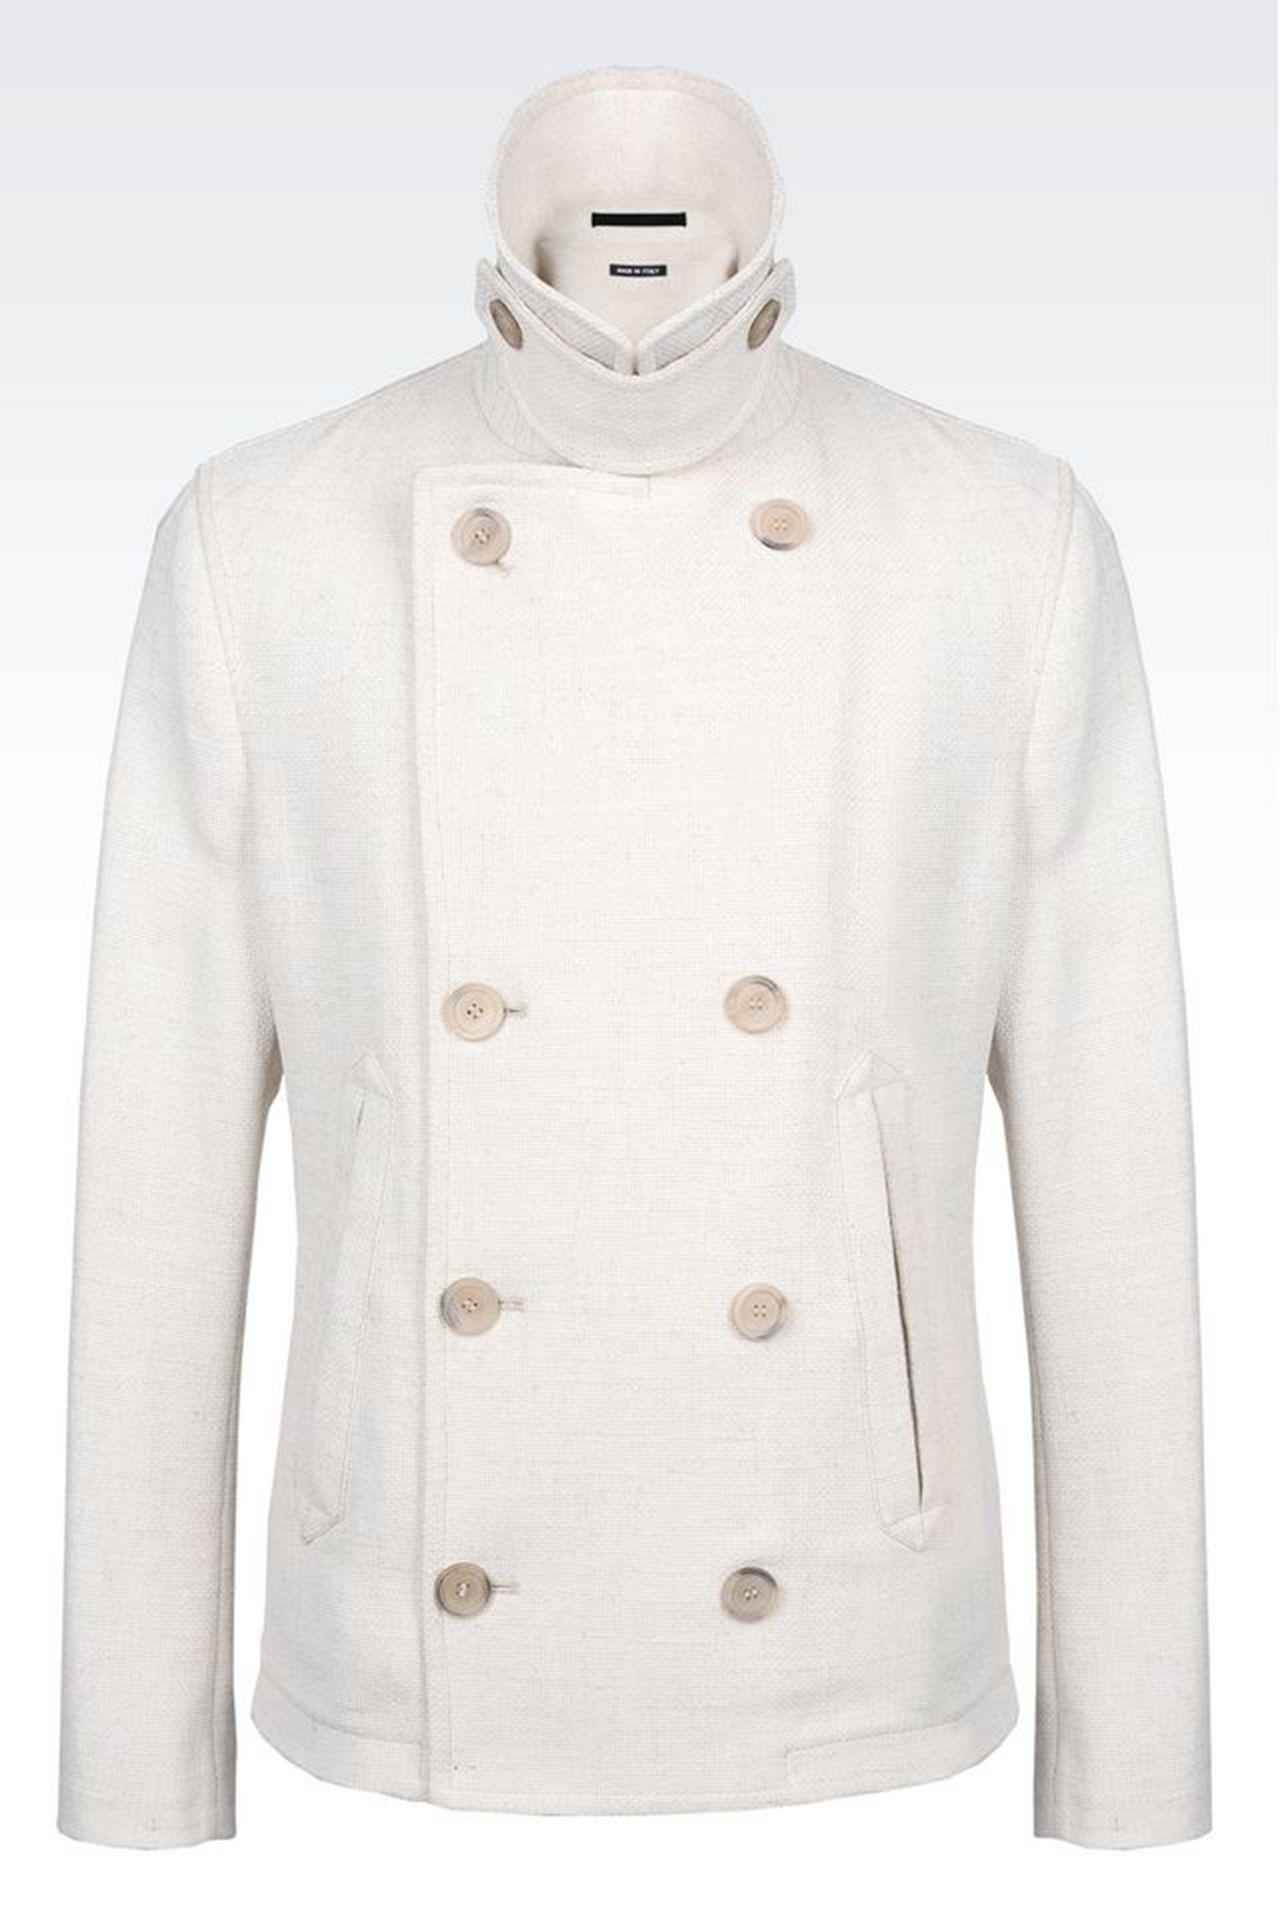 PEA COAT IN BASKETWEAVE: Coats Men by Armani - 0